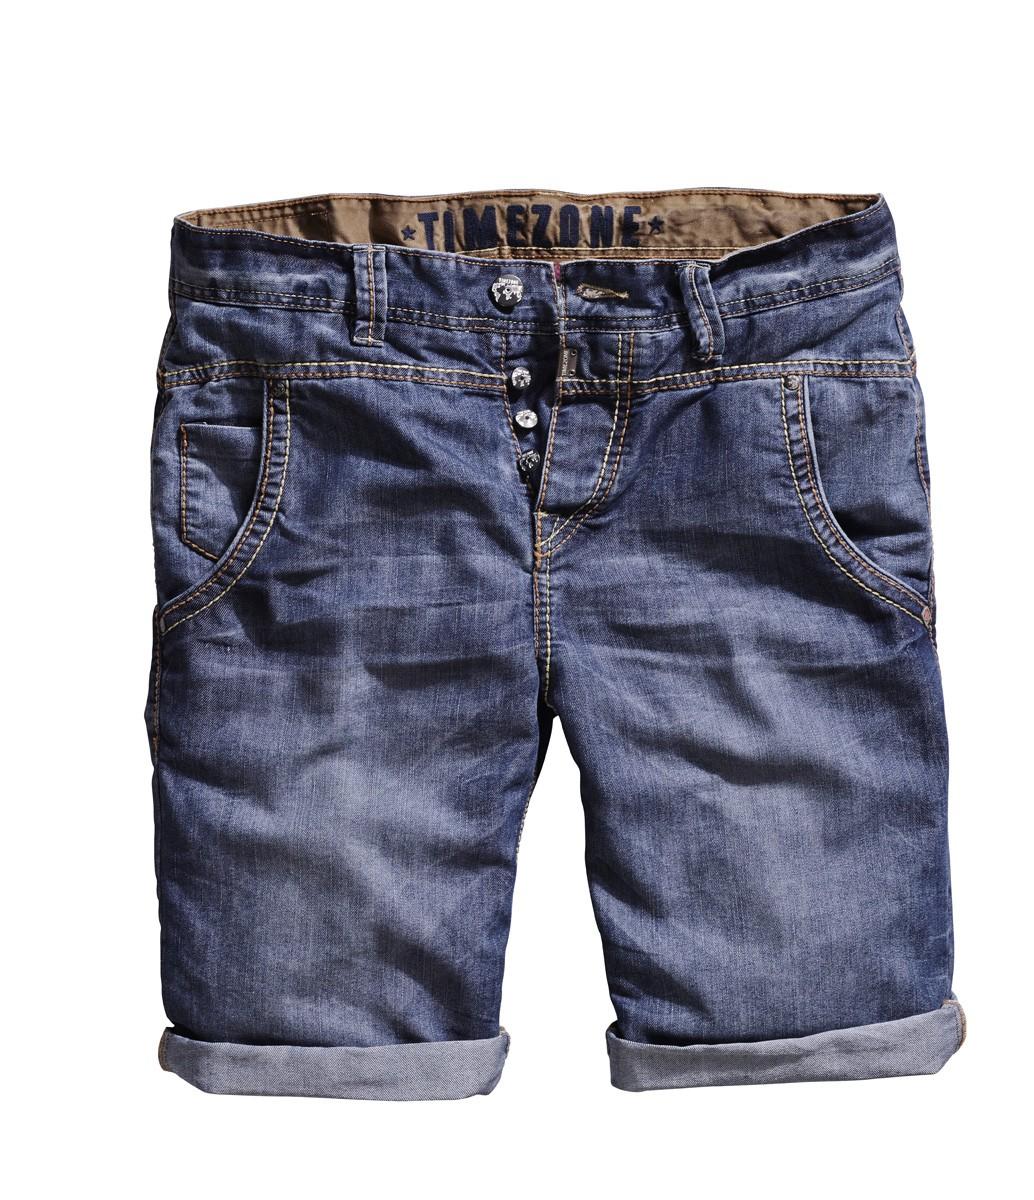 timezone herren jeans short stuad tz 25 5088 3212 3629. Black Bedroom Furniture Sets. Home Design Ideas